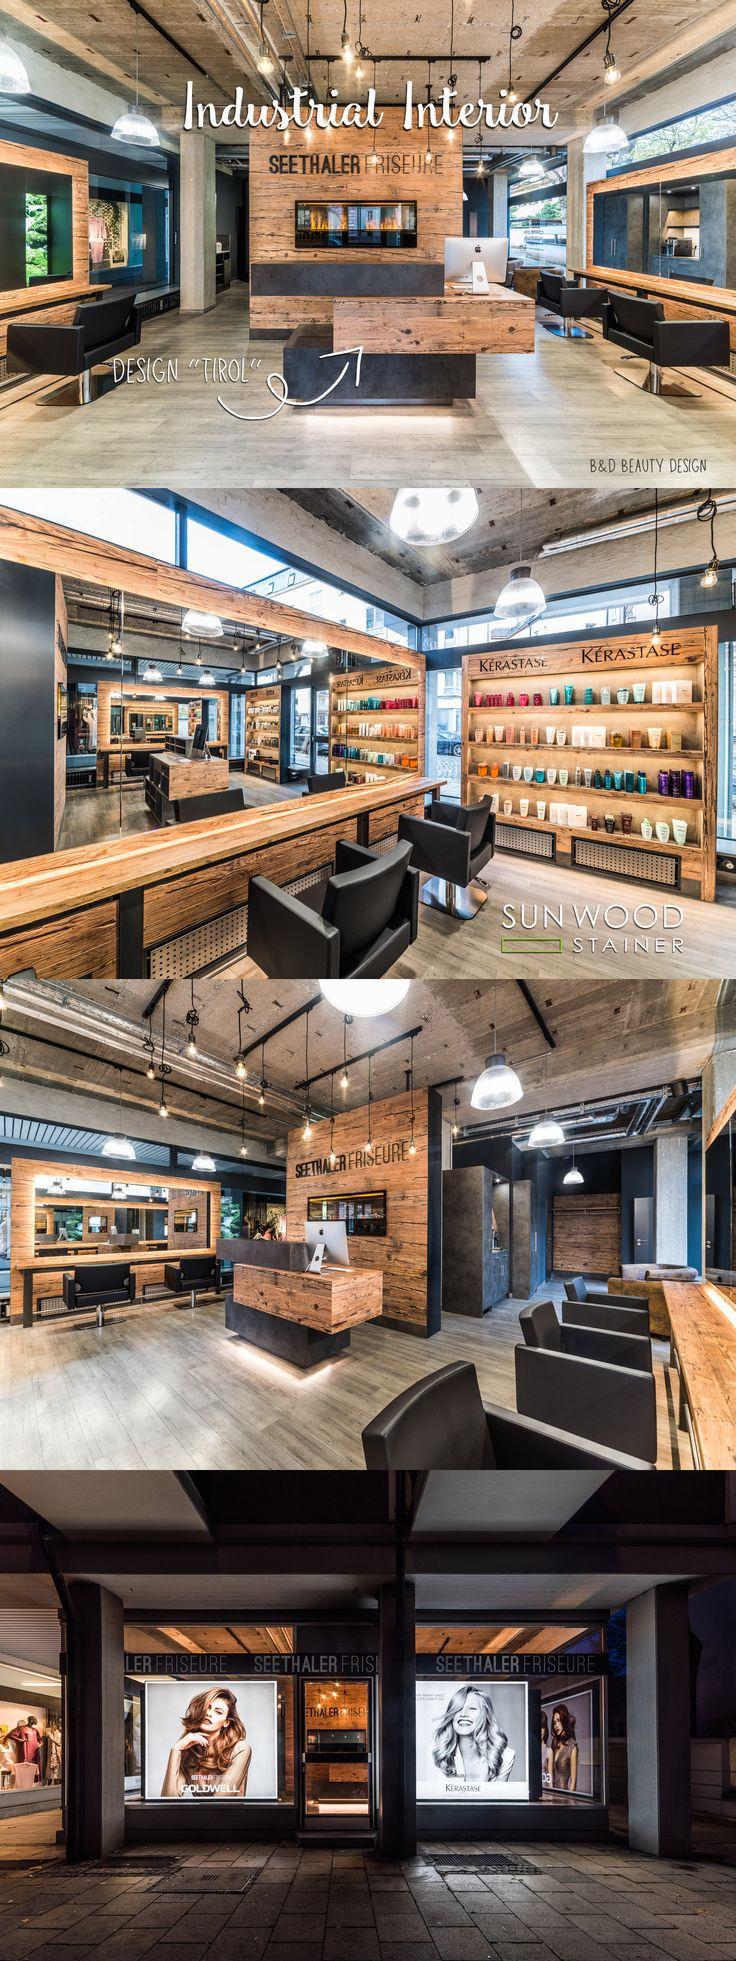 Holzdesign Interior, Einrichtungsideen, Frisörsaloon, Altholz, Used Look, Inter…